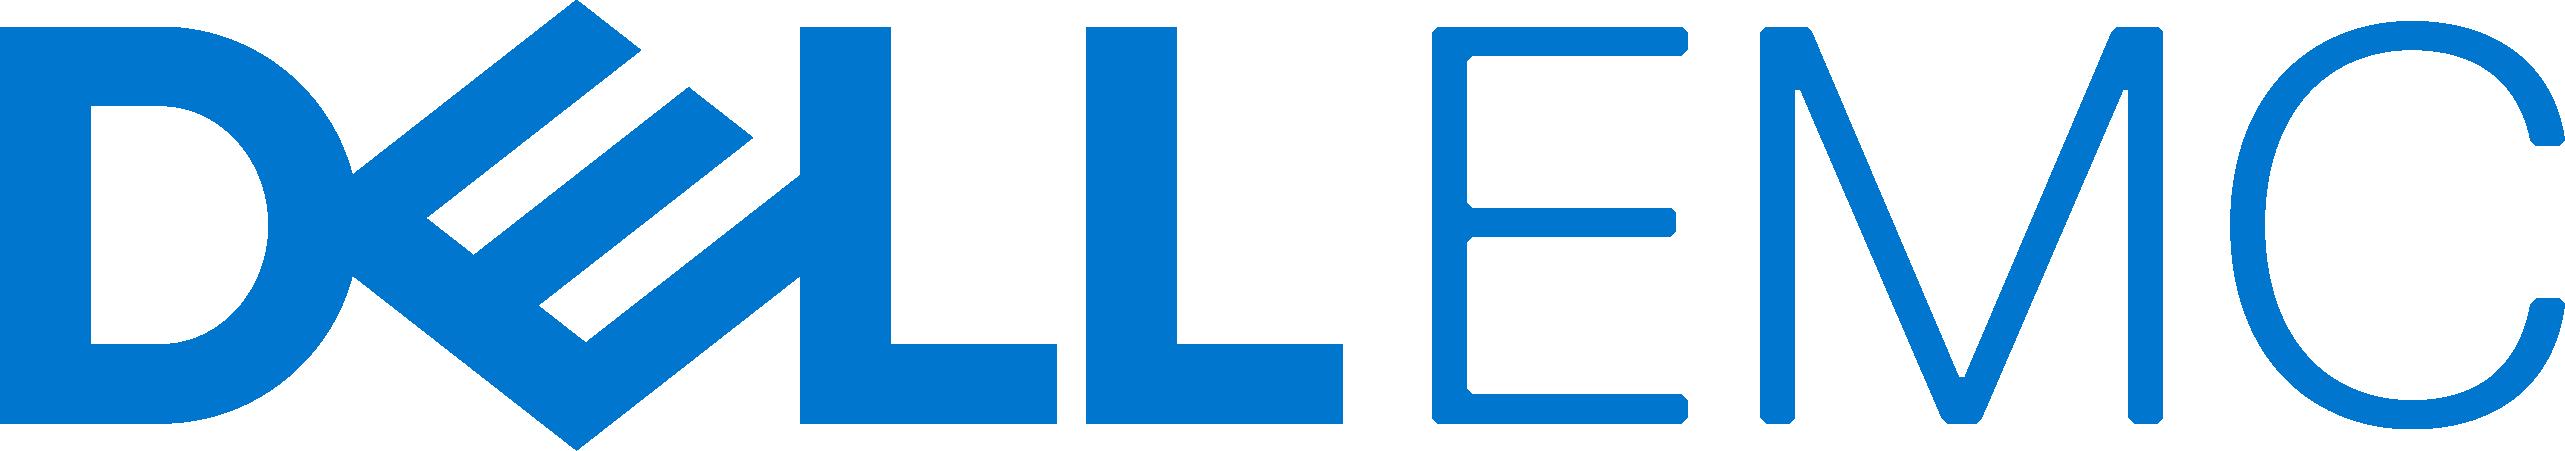 DellEMC_Logo_Prm_Blue_rgb.png?w=1024&h=180&scale